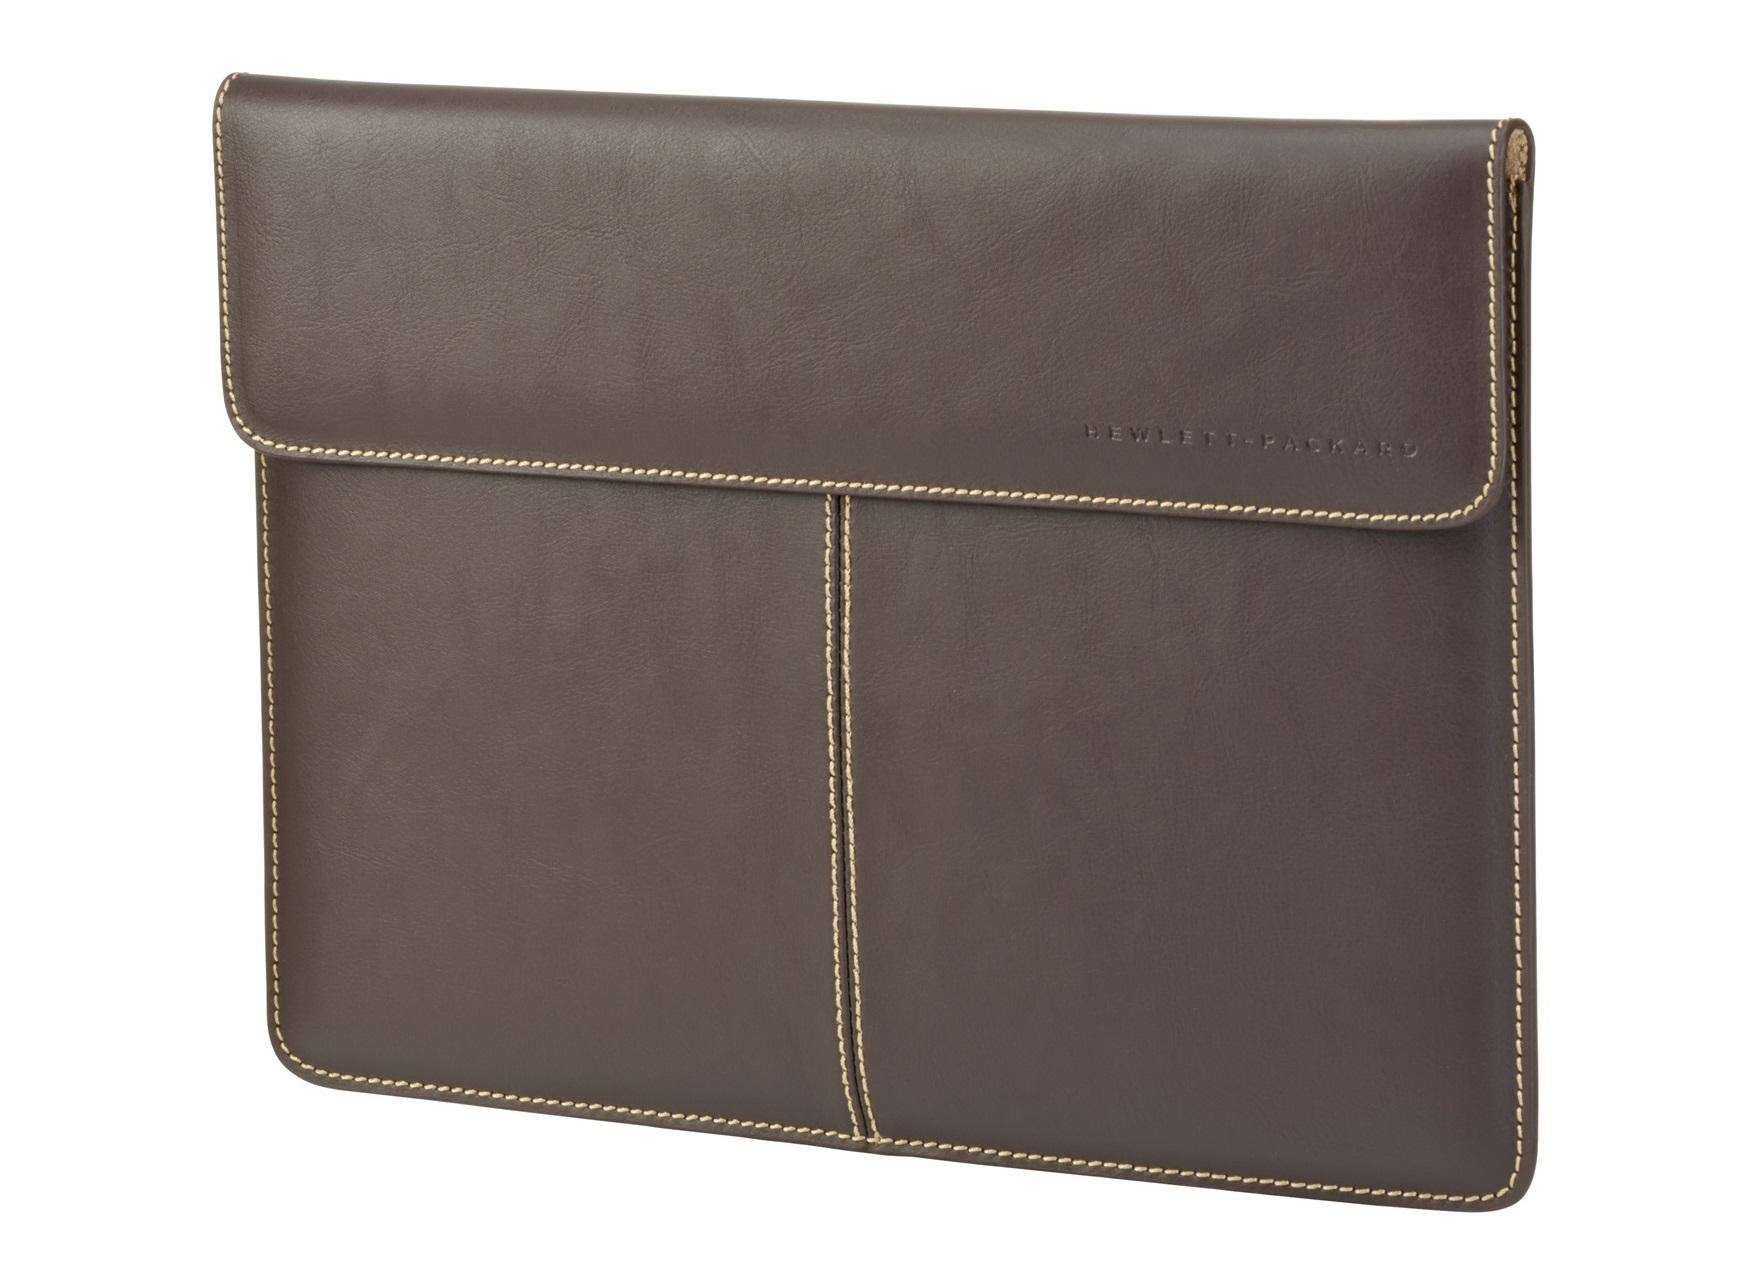 "HP 33.8 cm (13.3"") Premium Leather Sleeve 13.3"" Sleeve Brown"